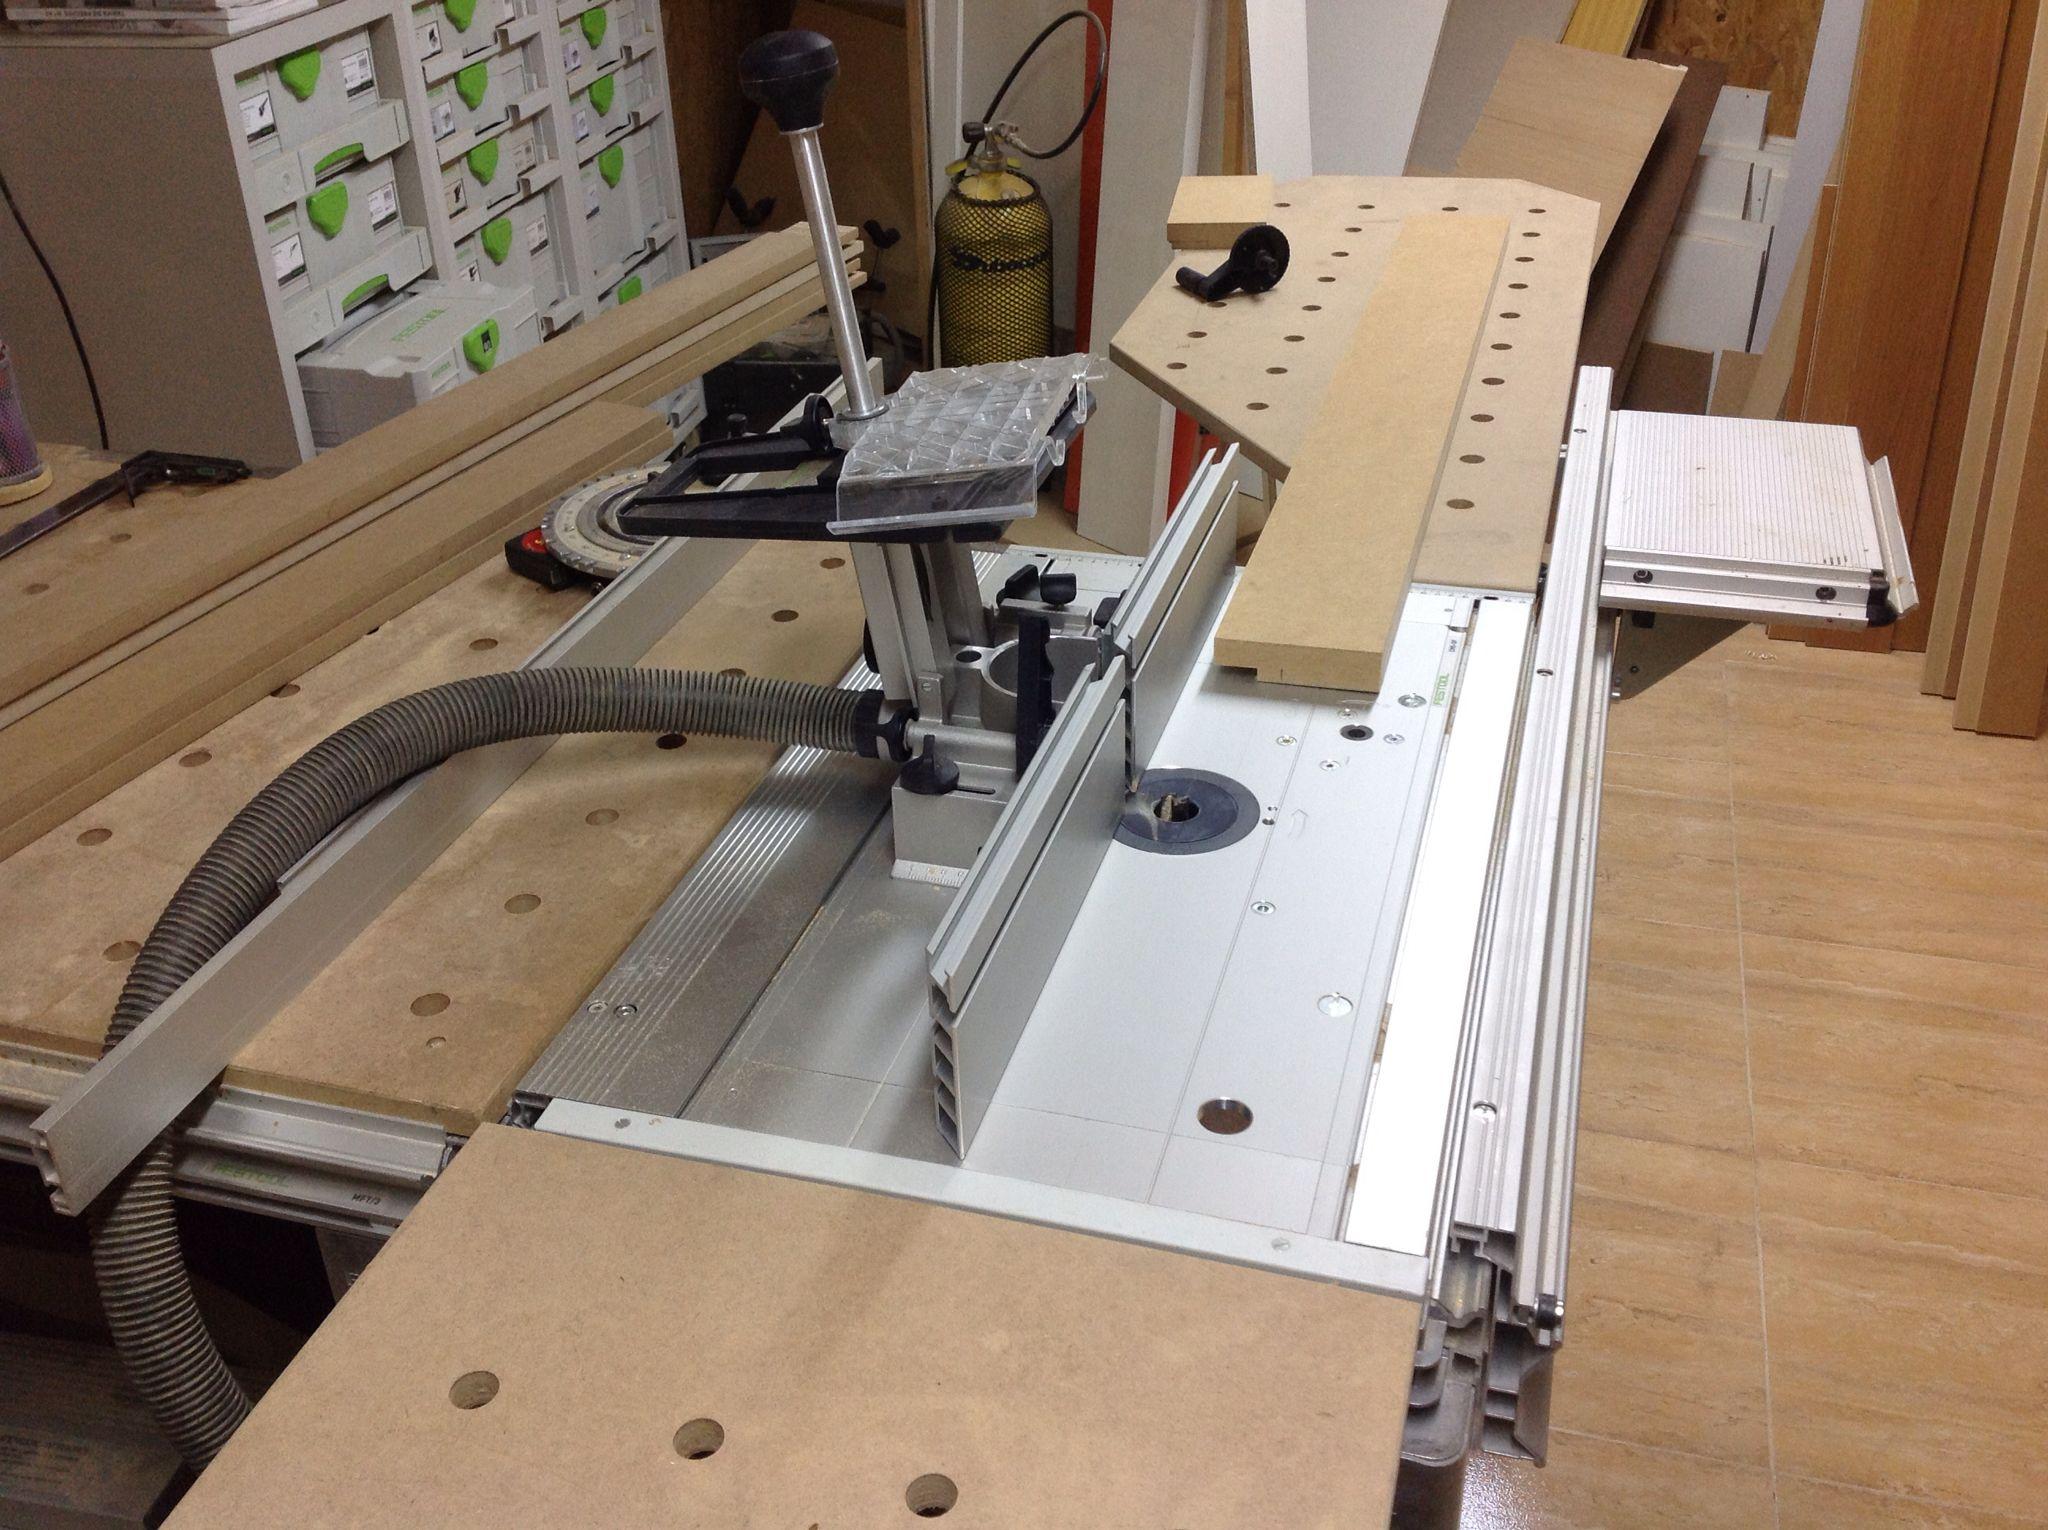 mtf sistema fresadora festool festool mft workbench sysport pinterest woodworking. Black Bedroom Furniture Sets. Home Design Ideas